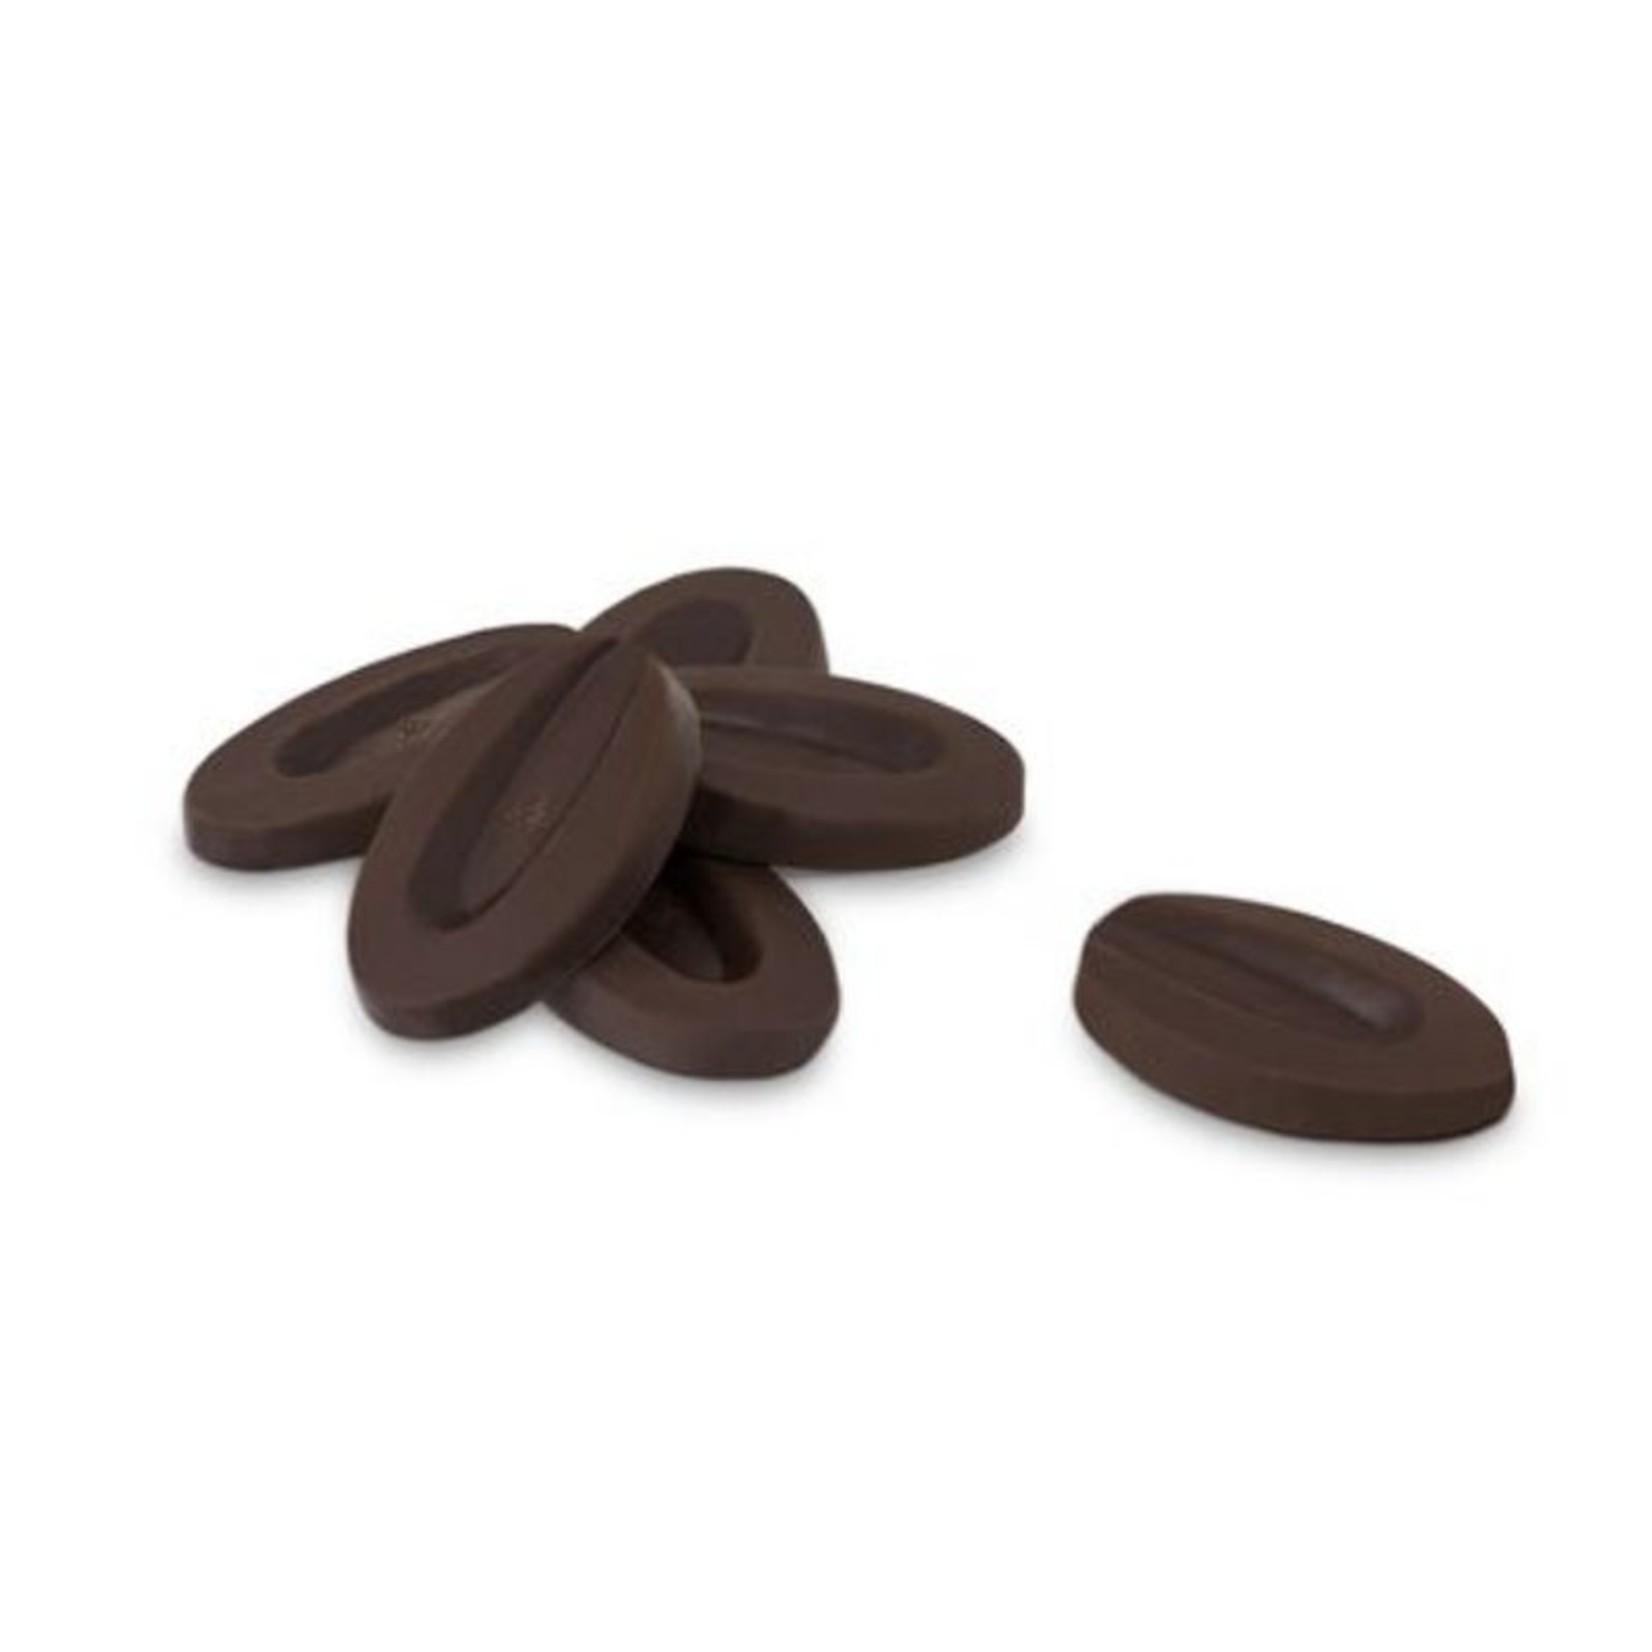 Valrhona Valrhona - Caraibe Dark Chocolate 66% - 1 lb, 4654-R